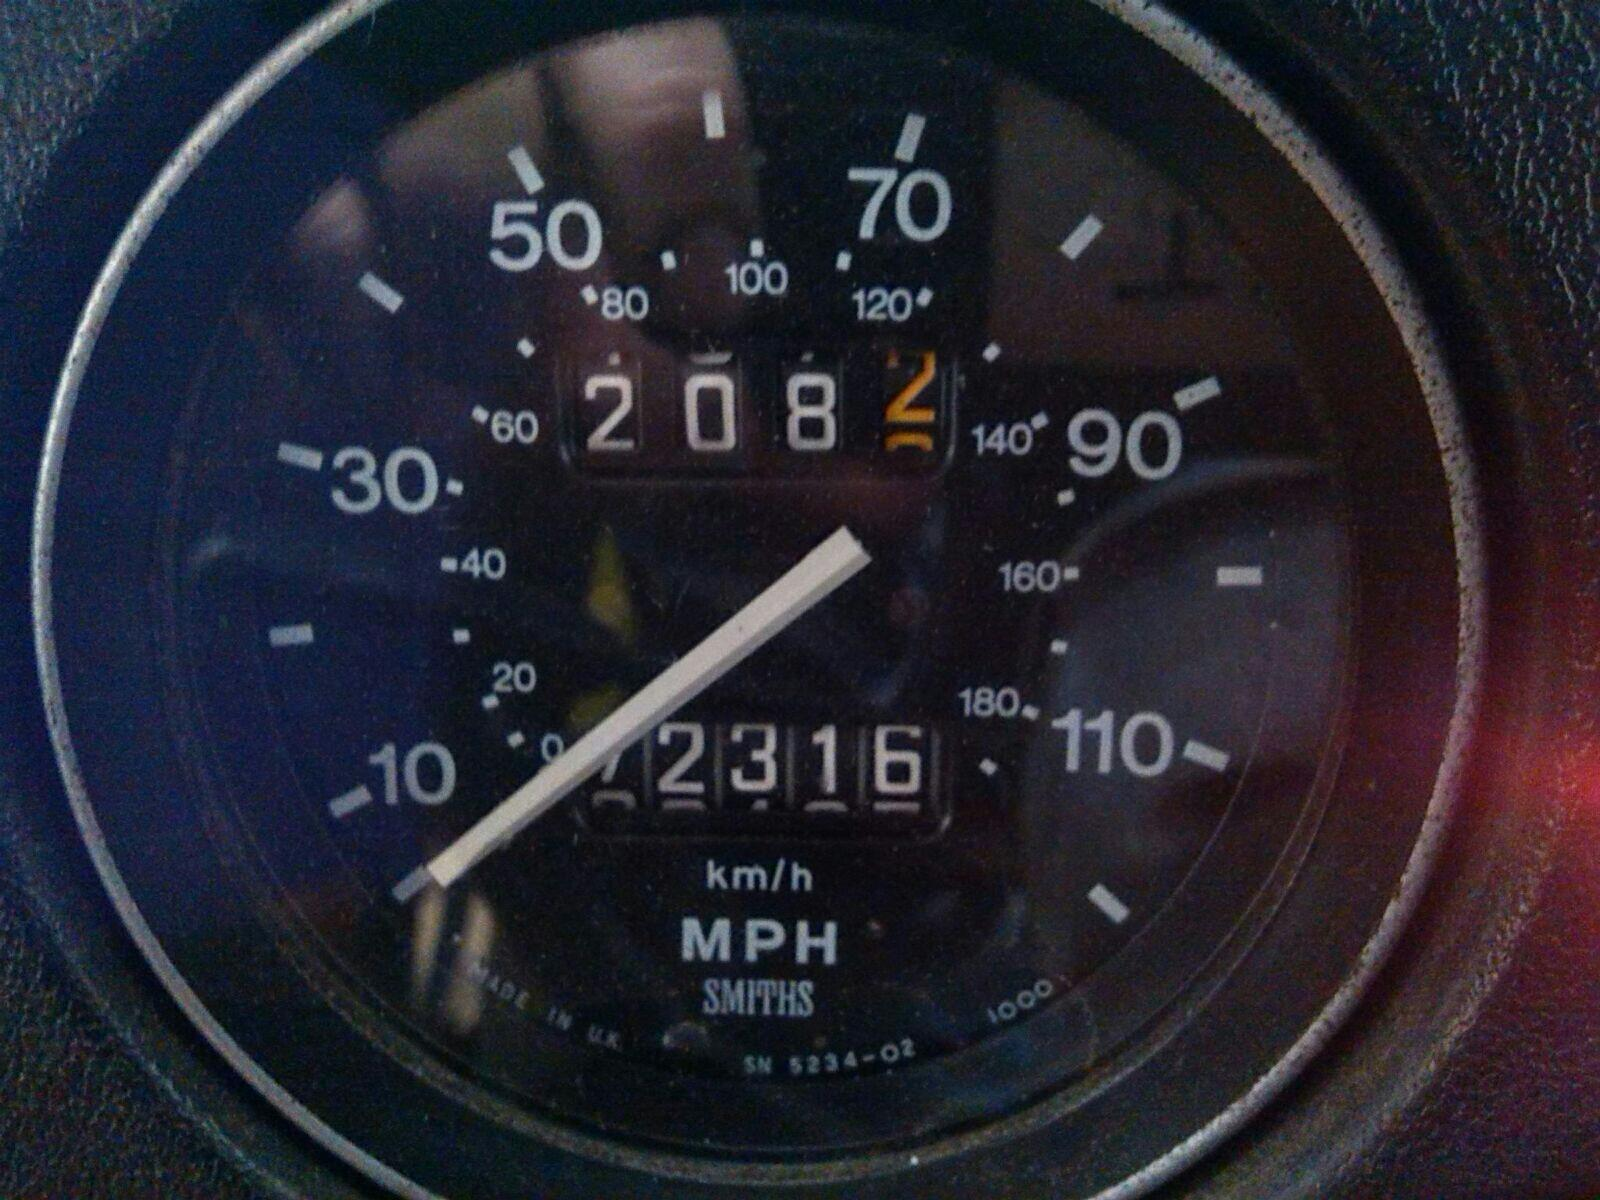 1981 MG B 1973 To 1980 2 Door Coupe (Petrol / Manual